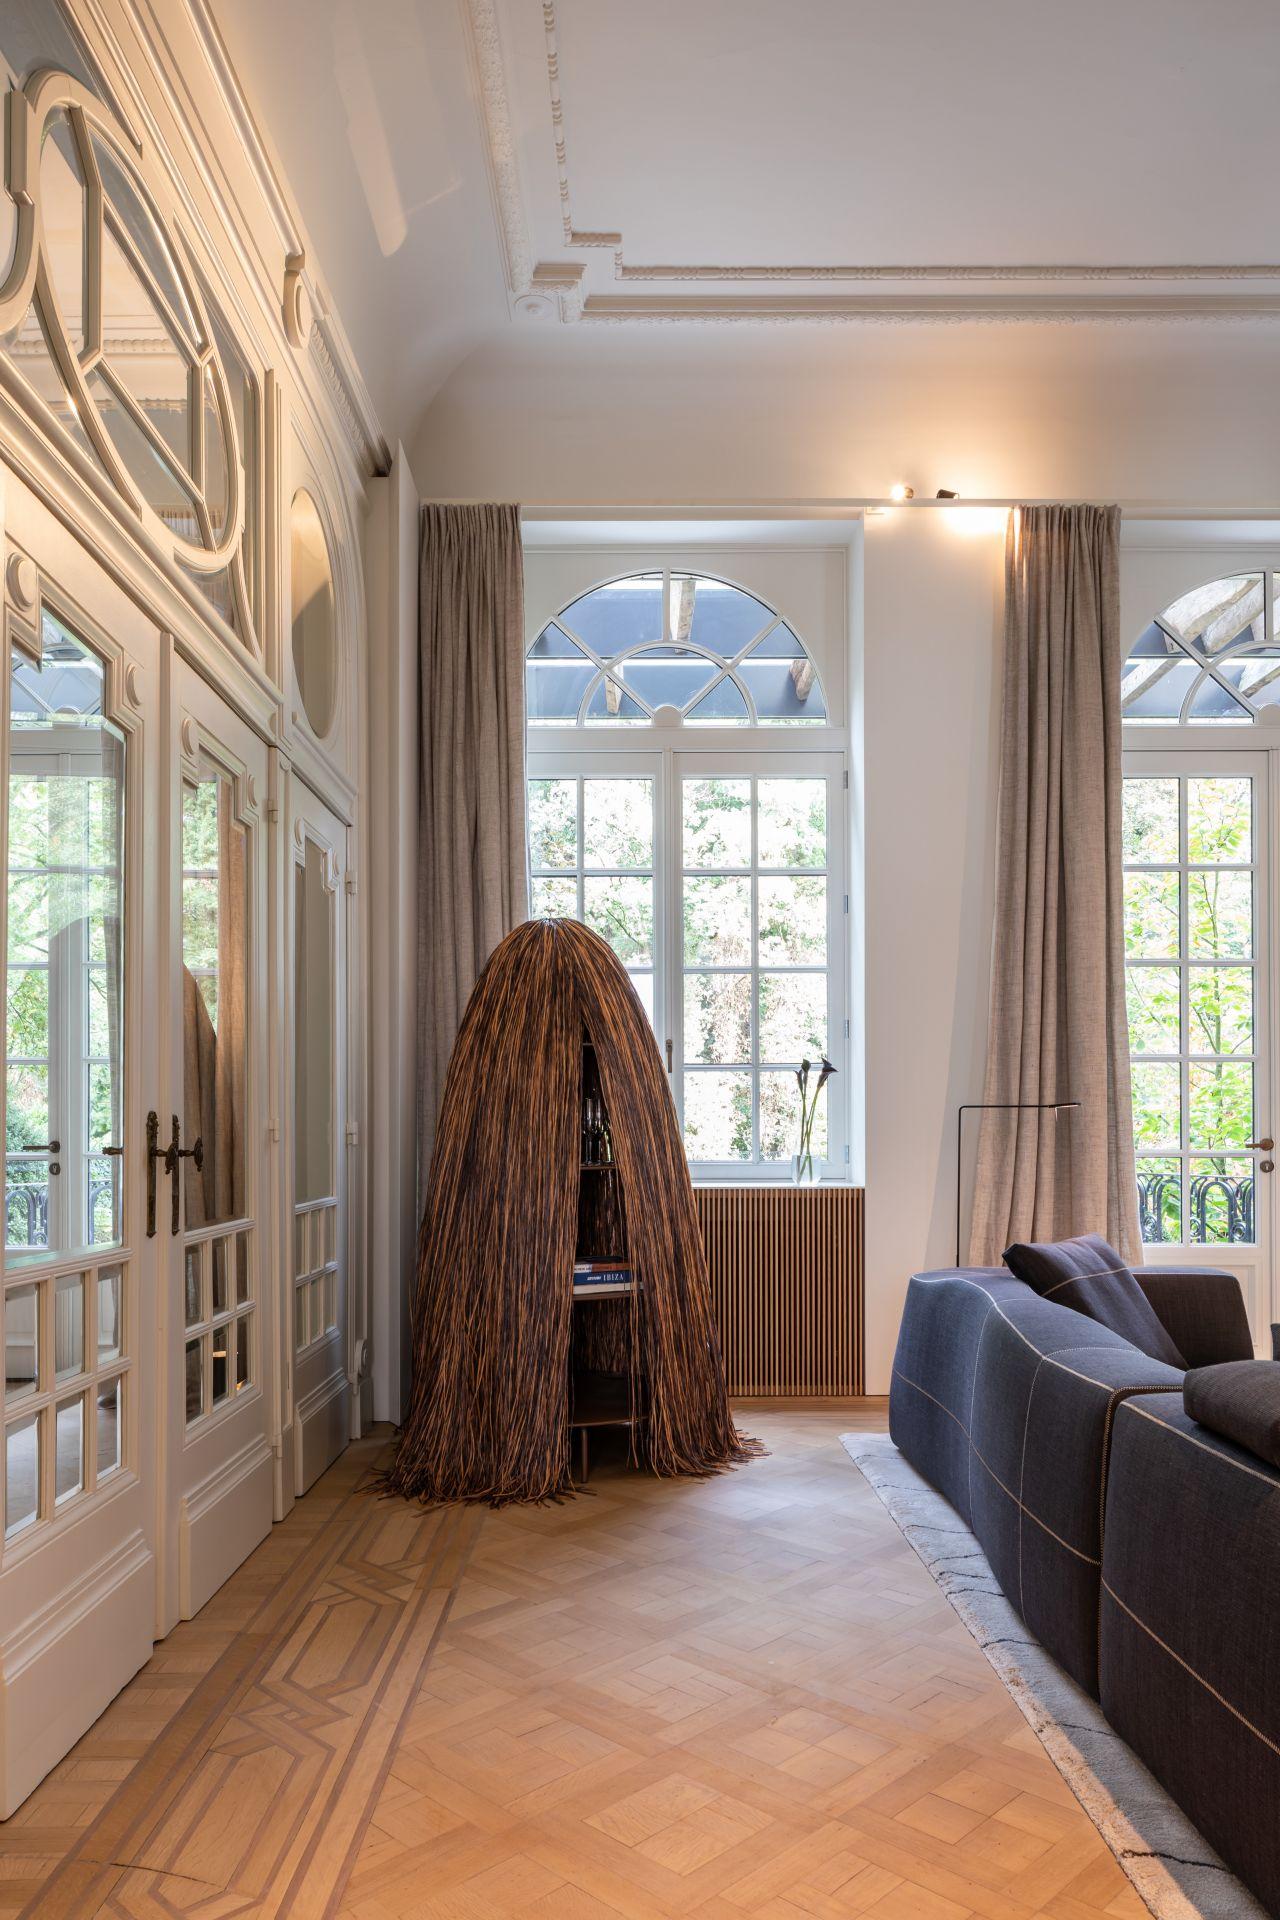 Appartamento ad Anversa - image 8